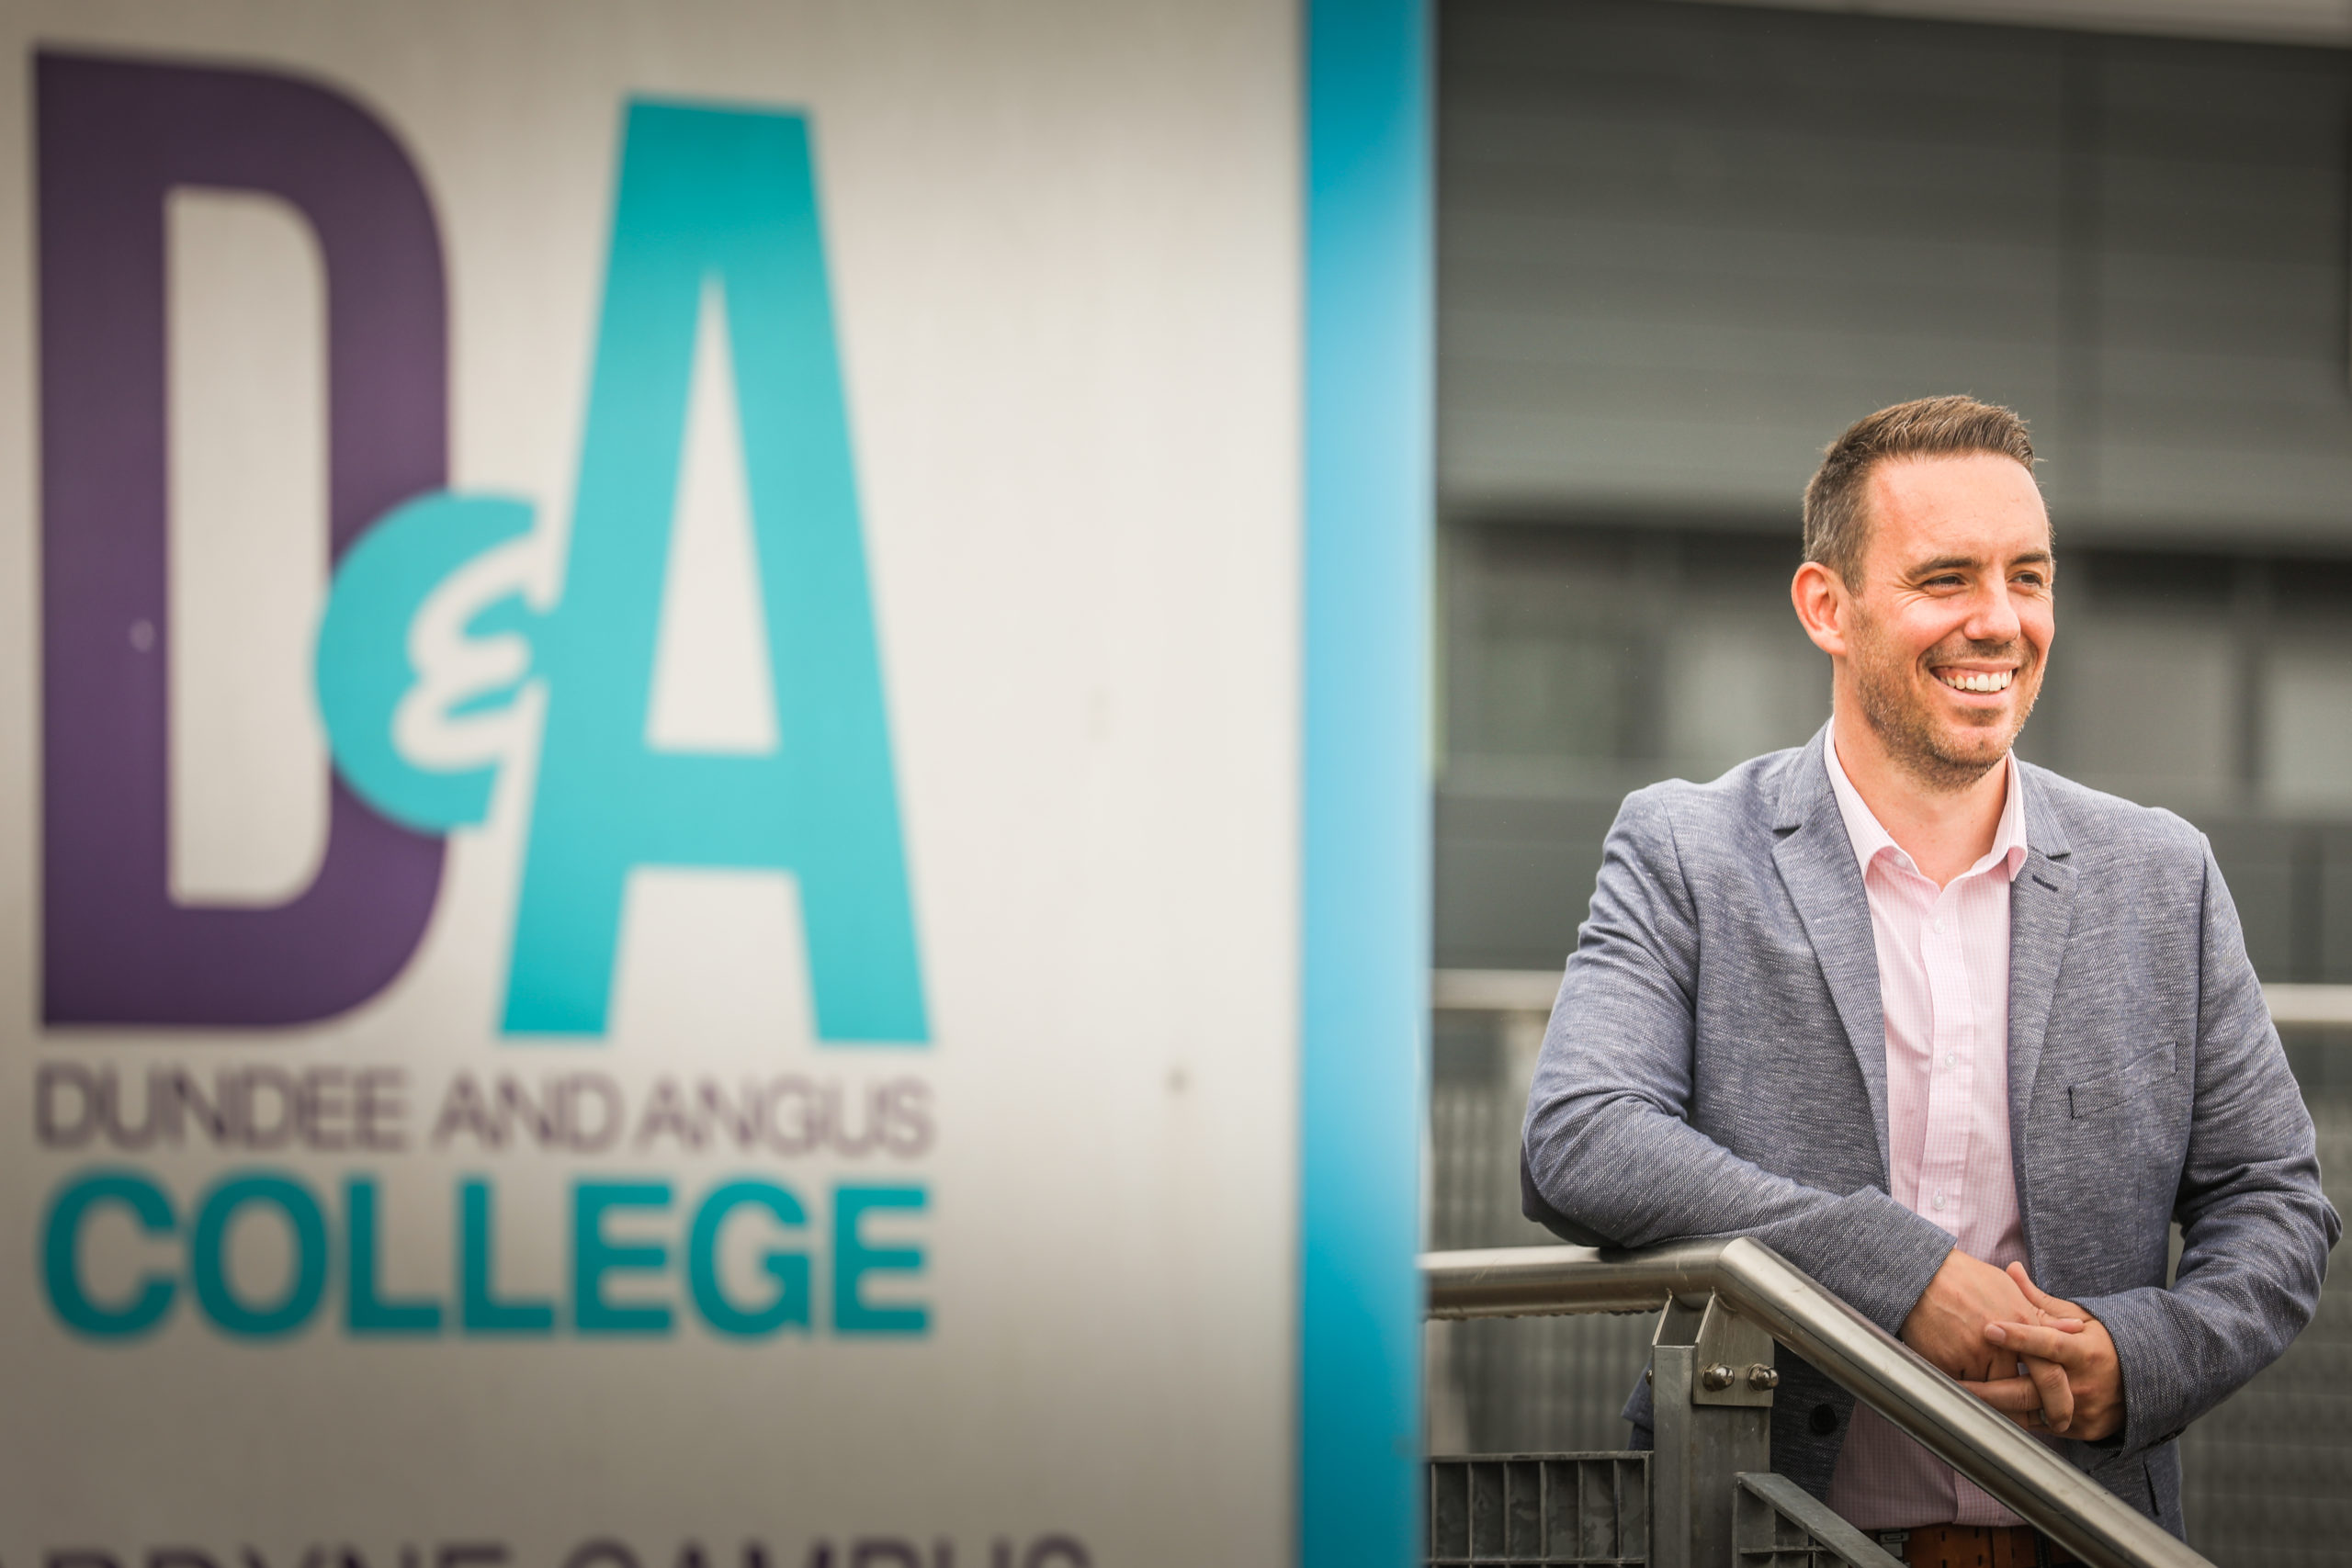 New principal of Dundee and Angus College, Simon Hewitt.